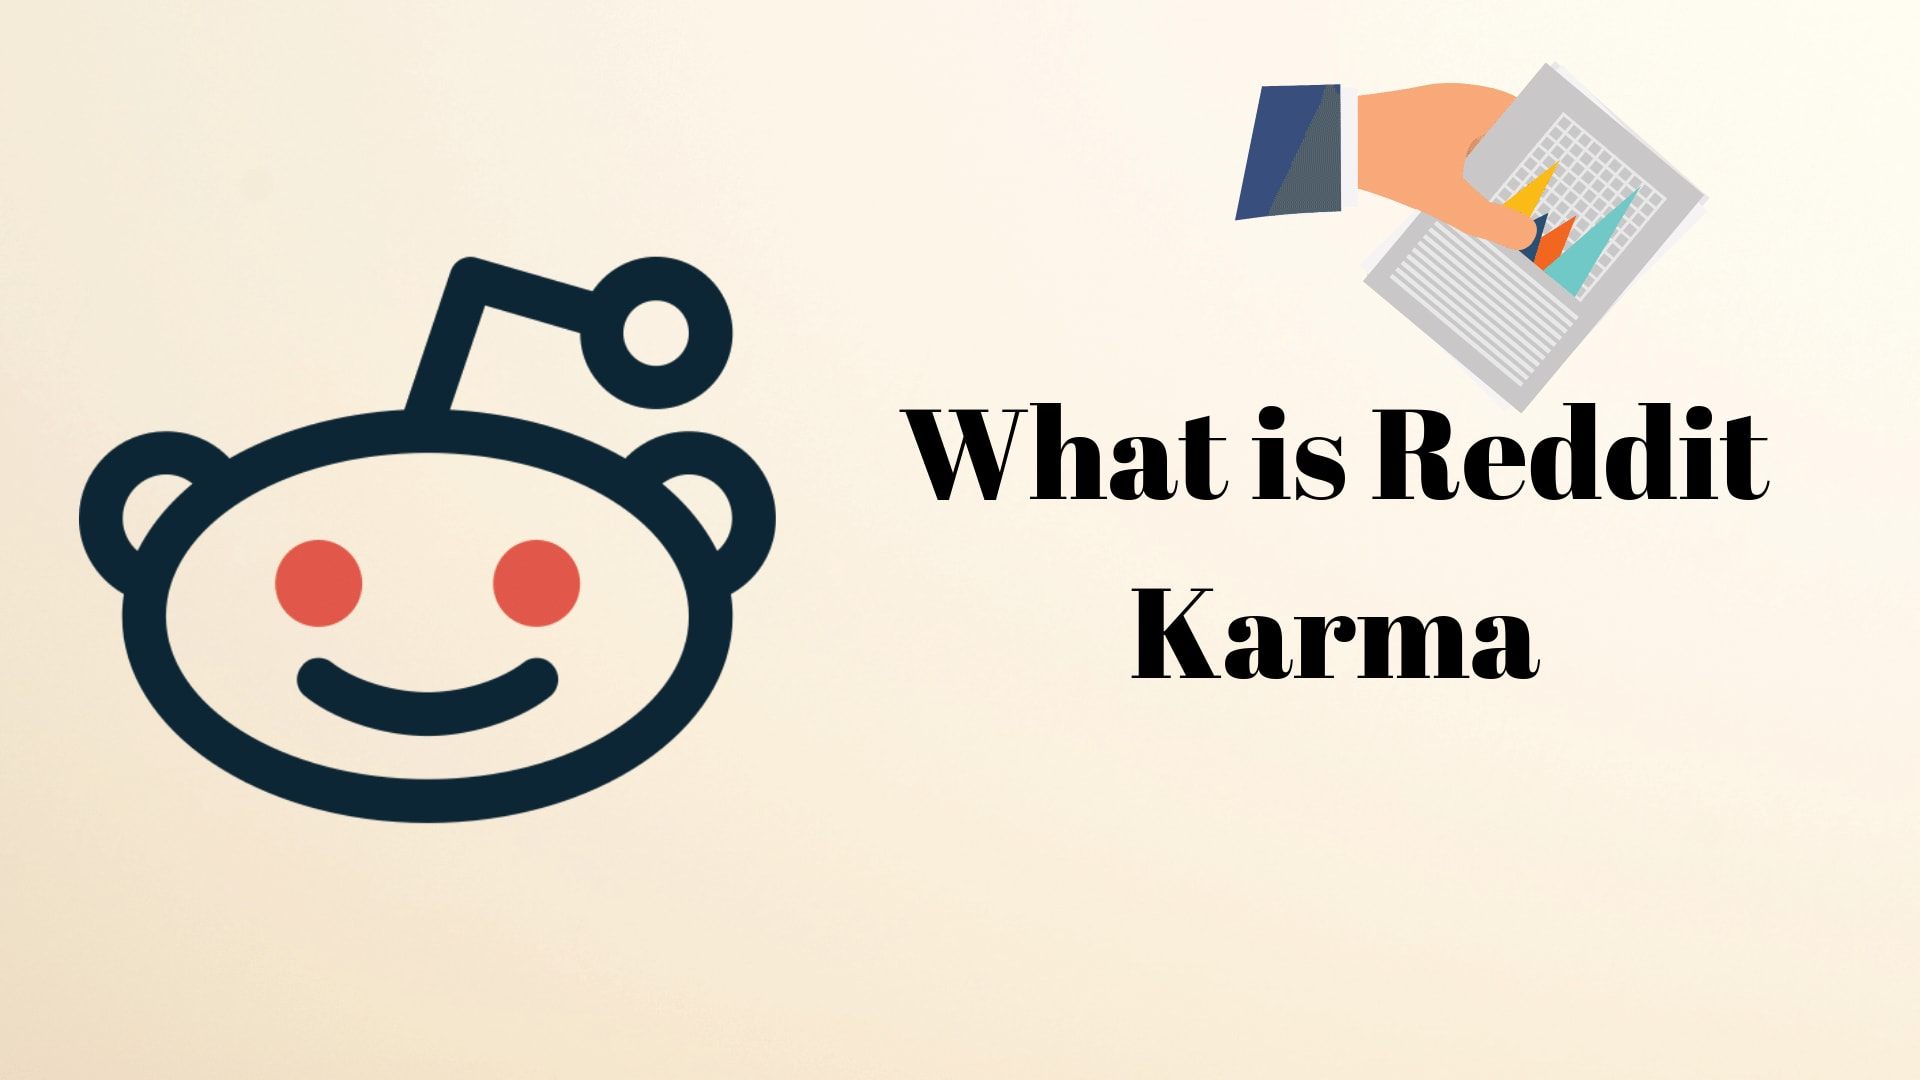 What is Reddit Karma - What is Reddit Karma and Reddit Gold?